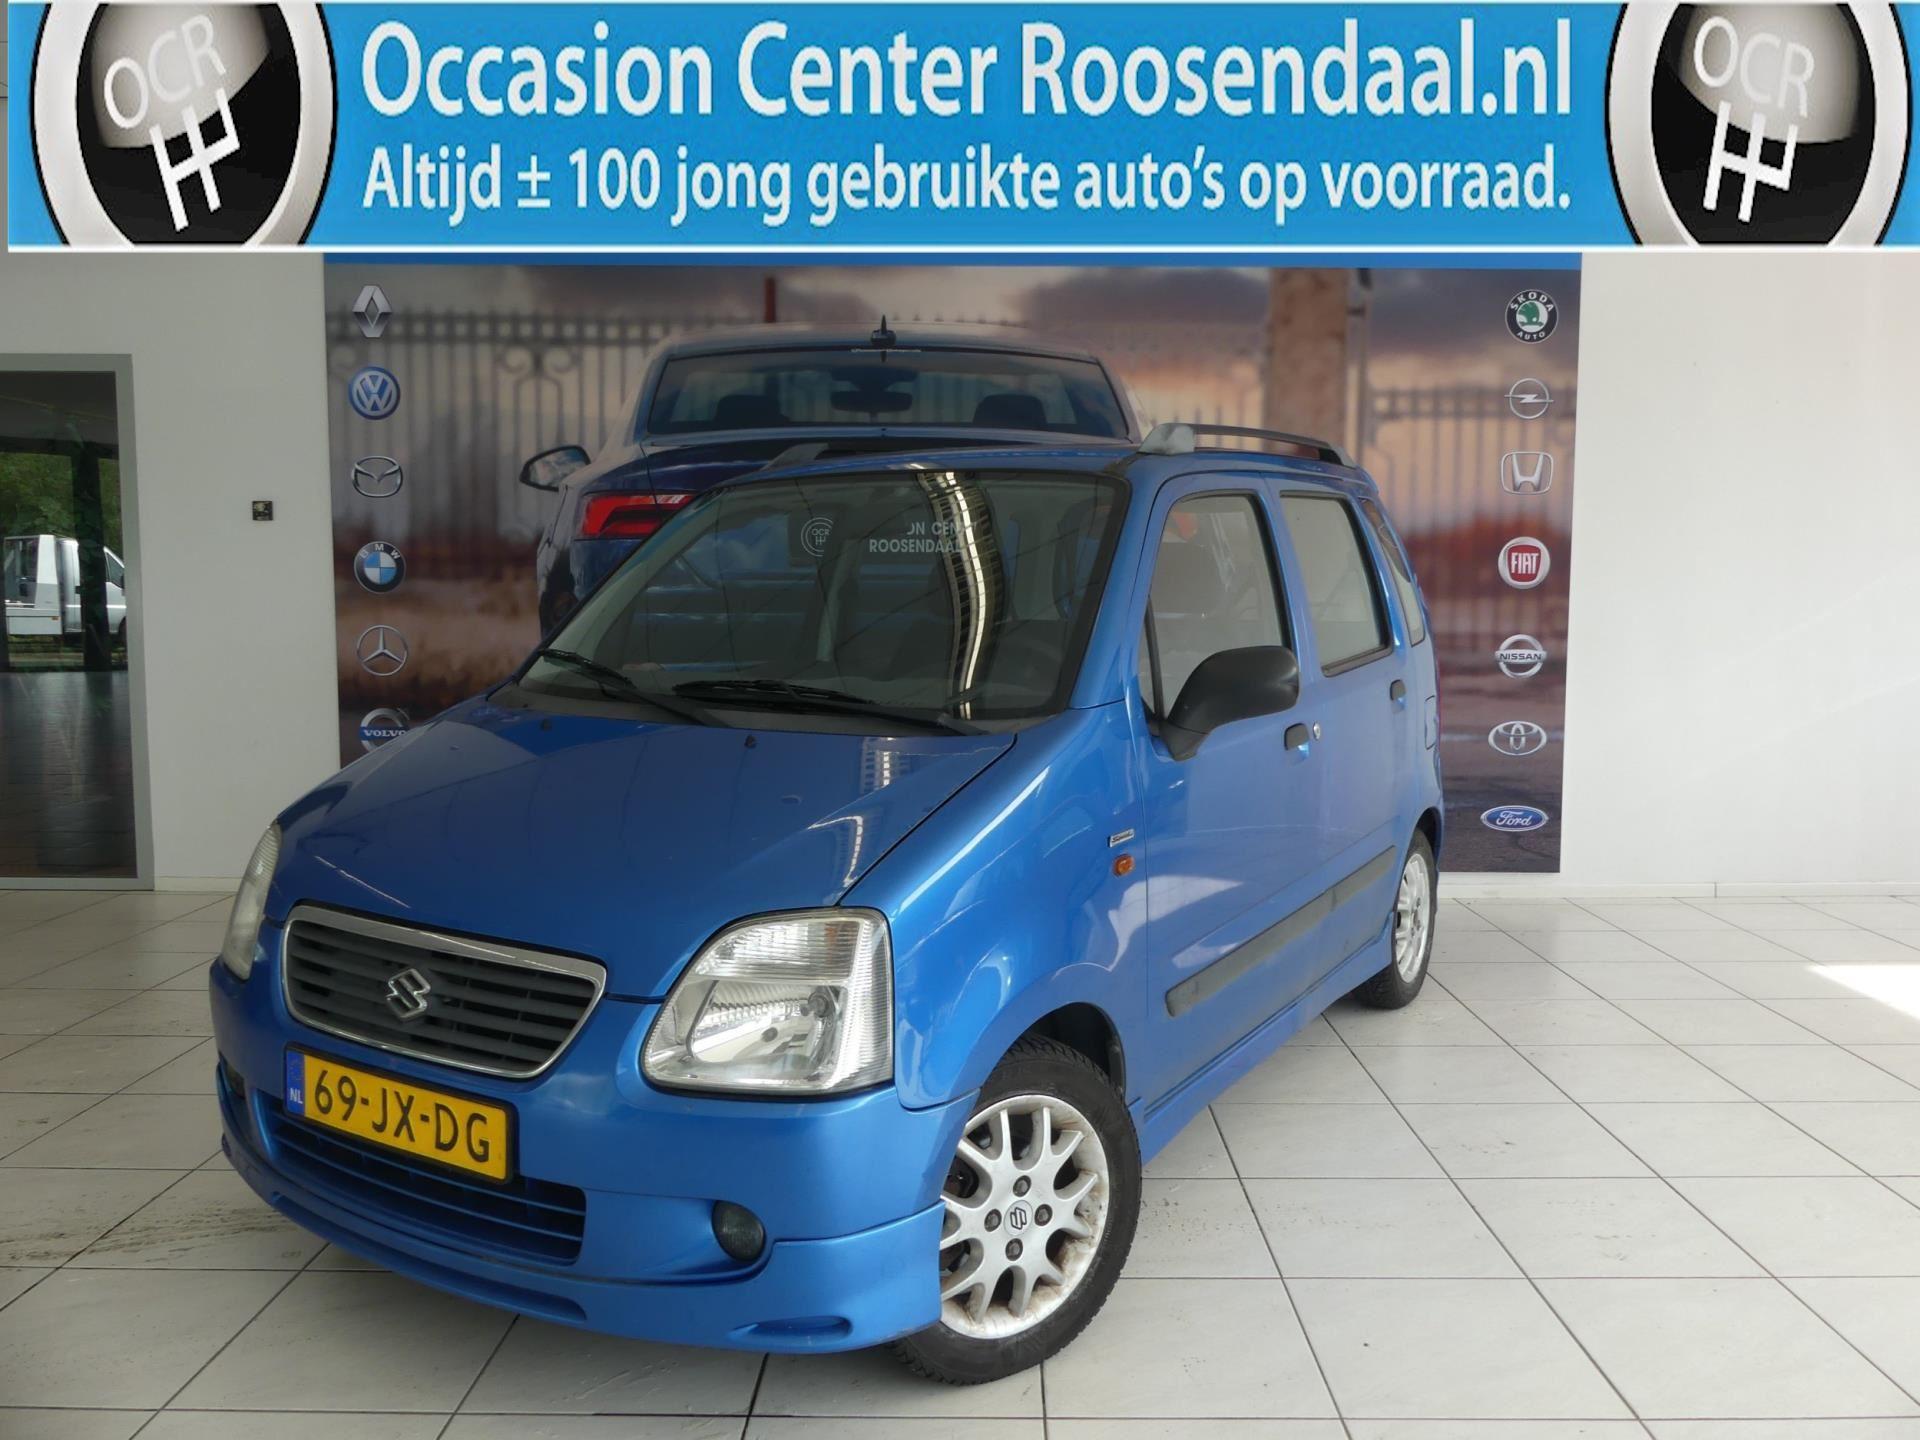 Suzuki Wagon R occasion - Occasion Center Roosendaal